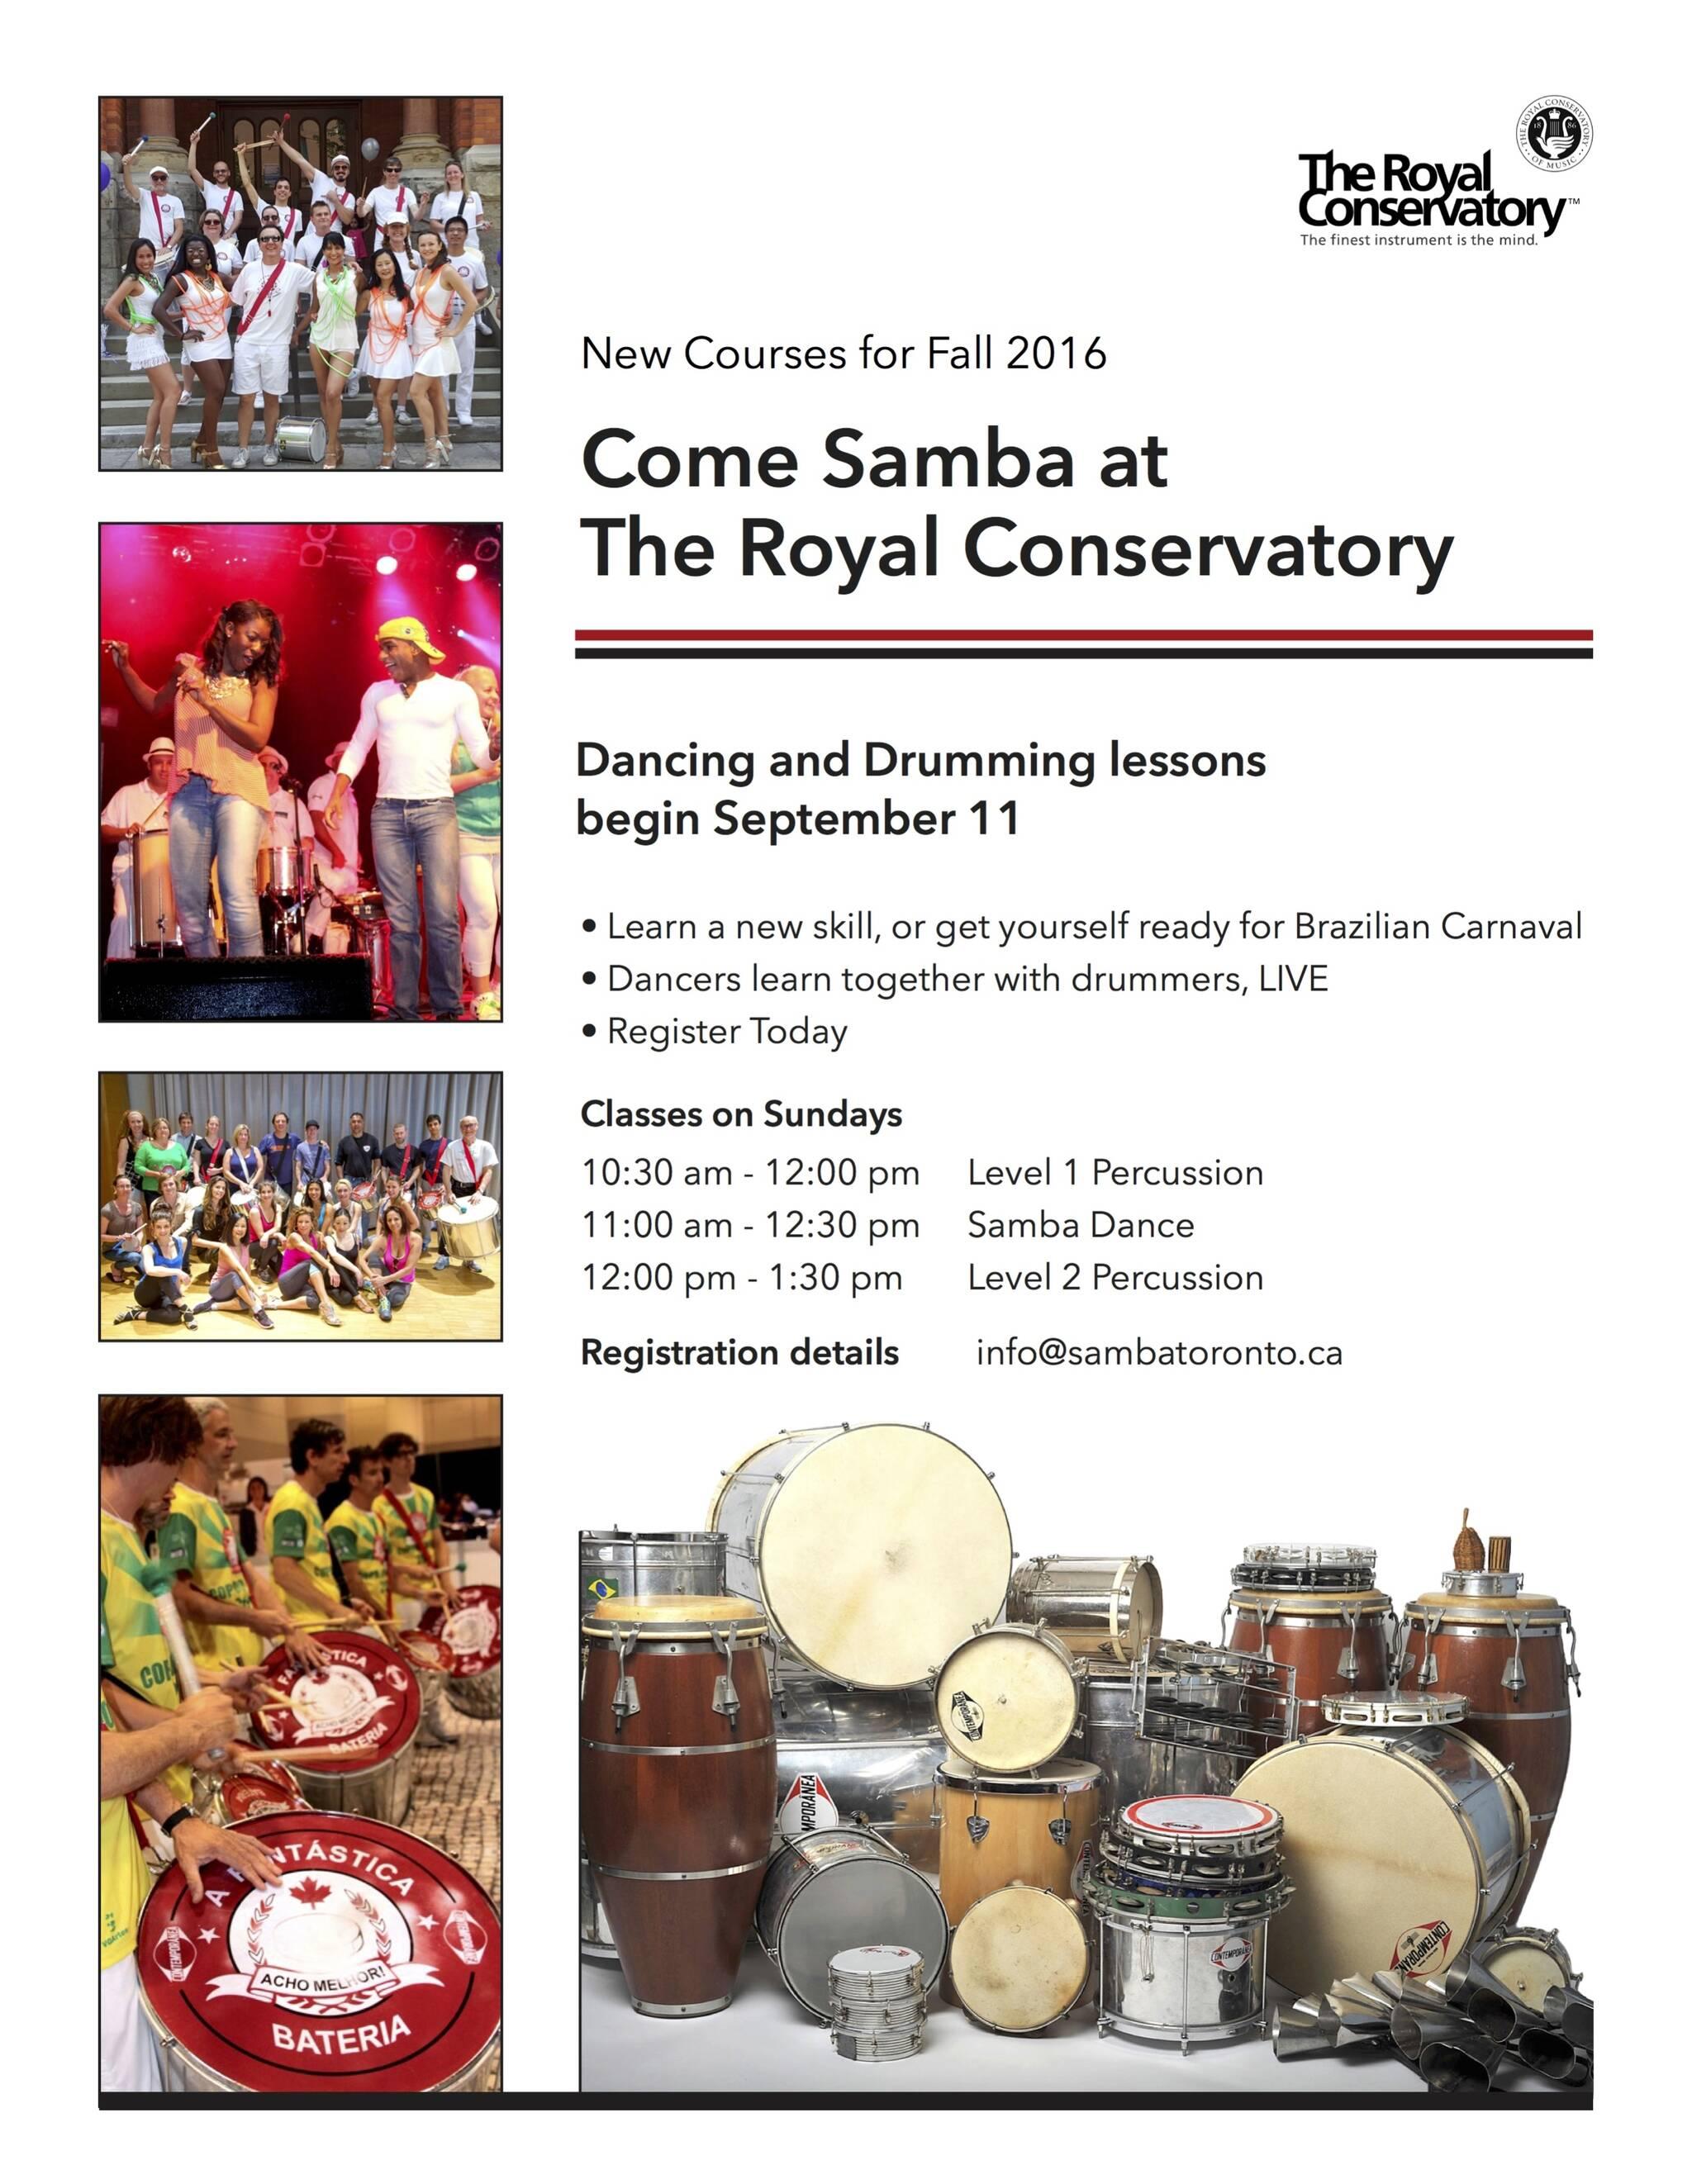 Samba Sundays at The Royal Conservatory